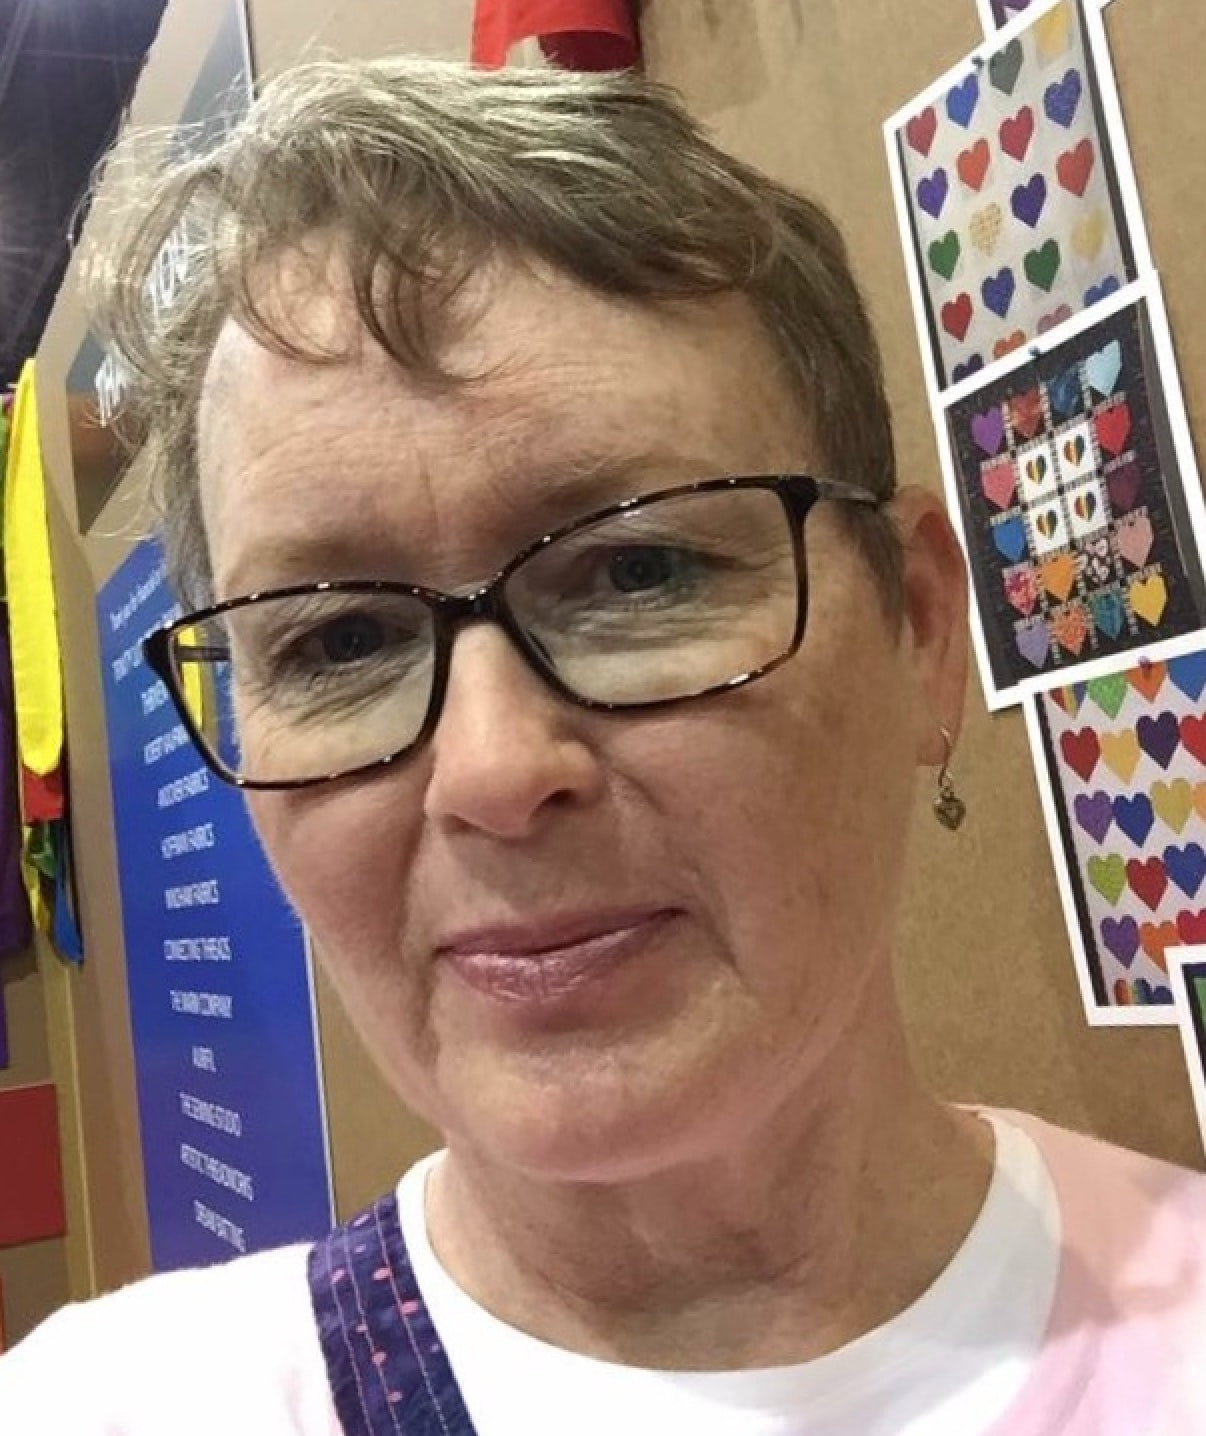 Go to Cynthia Bowers's profile